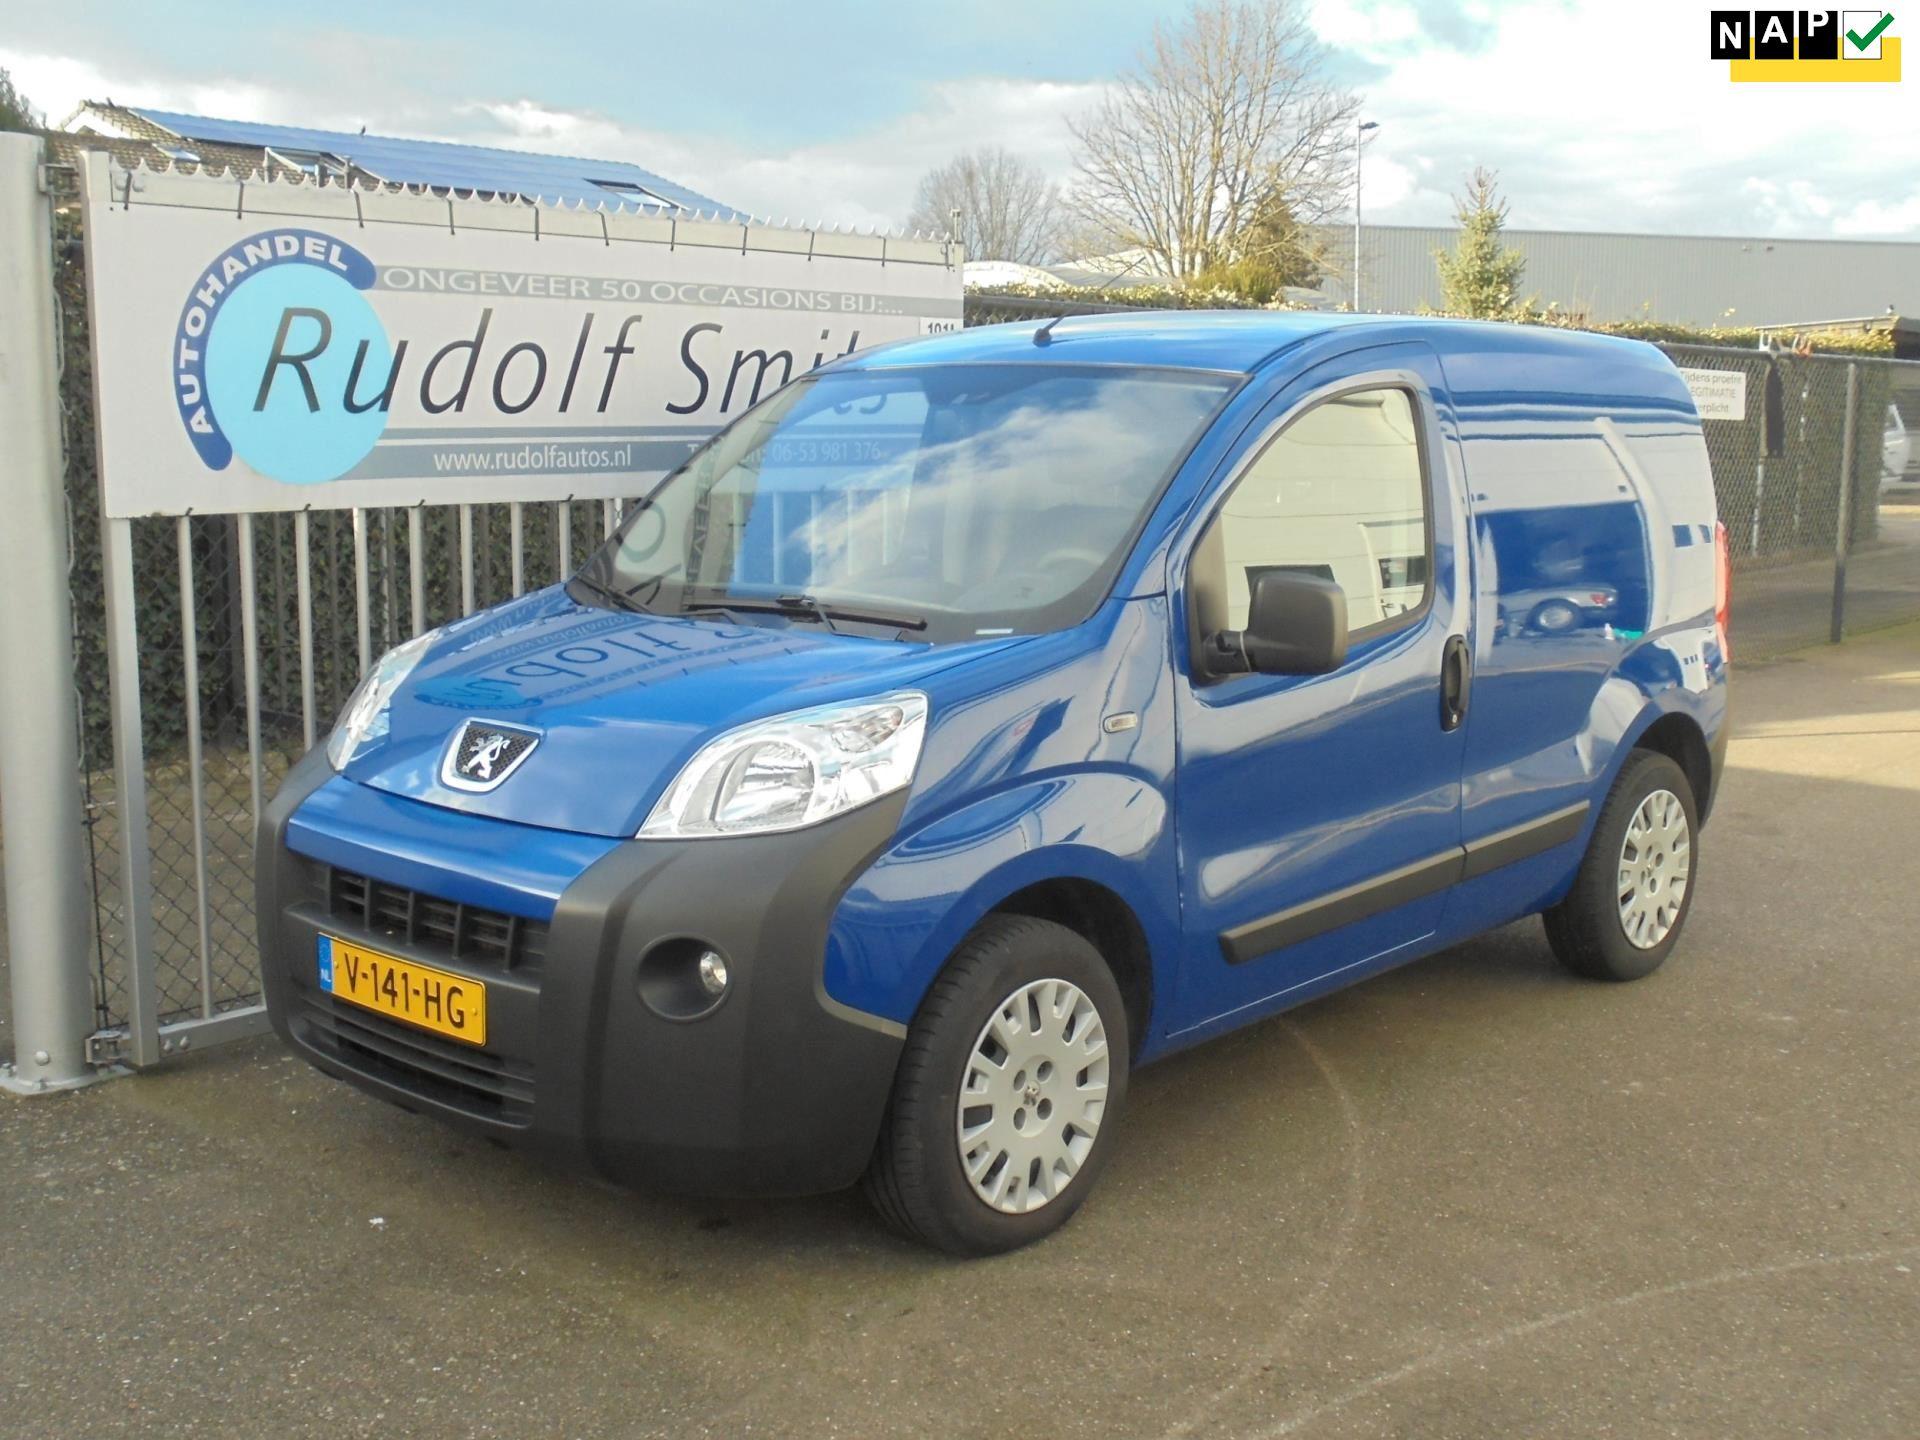 Peugeot Bipper occasion - Autohandel Rudolf Smits